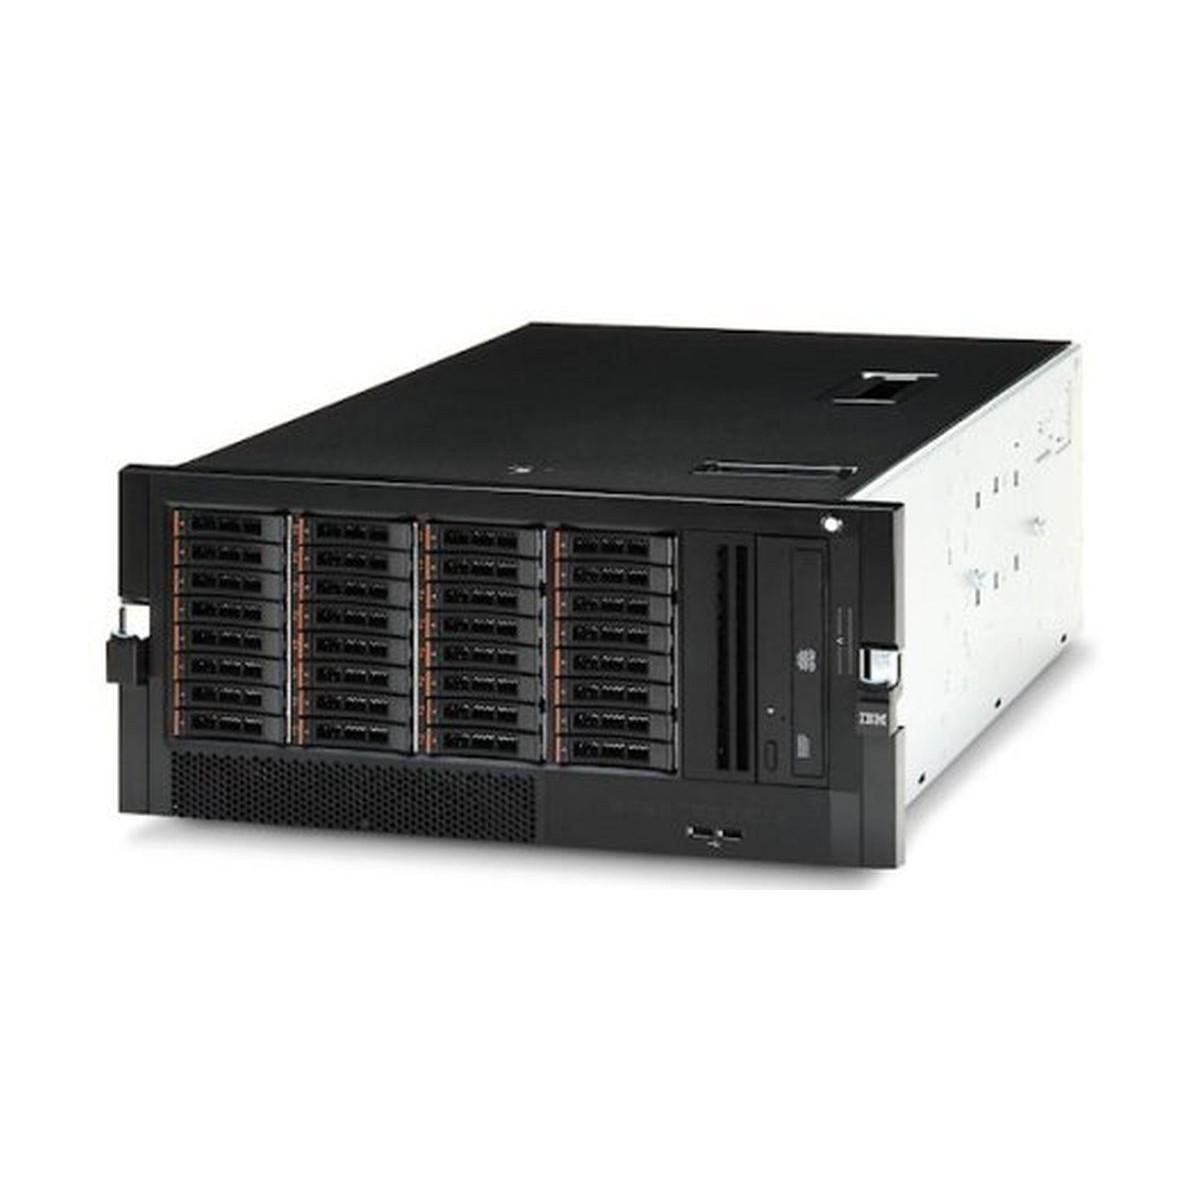 FUJITSU PRIMERGY RX100 S5 3.0 DC 4GB 2x146Gb SAS